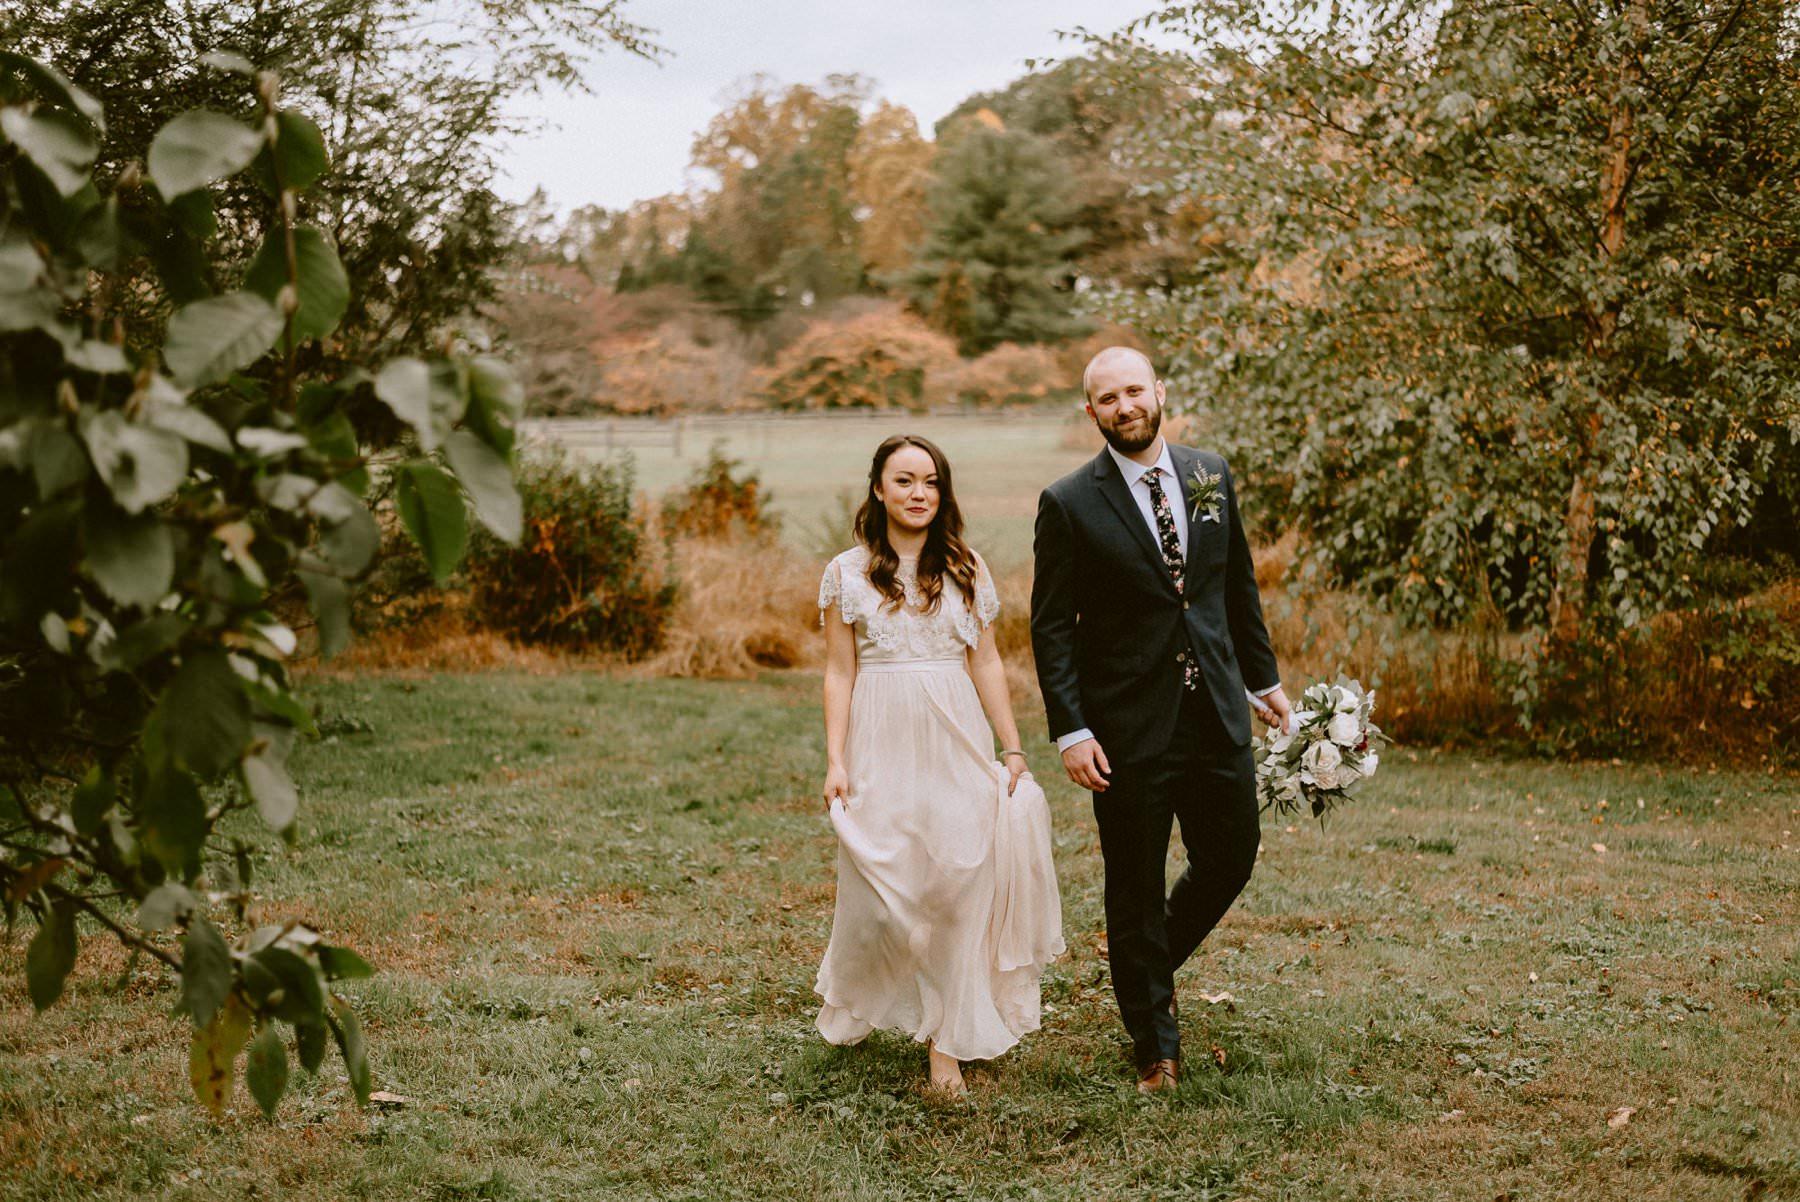 Tyler_arboretum_wedding-051.jpg